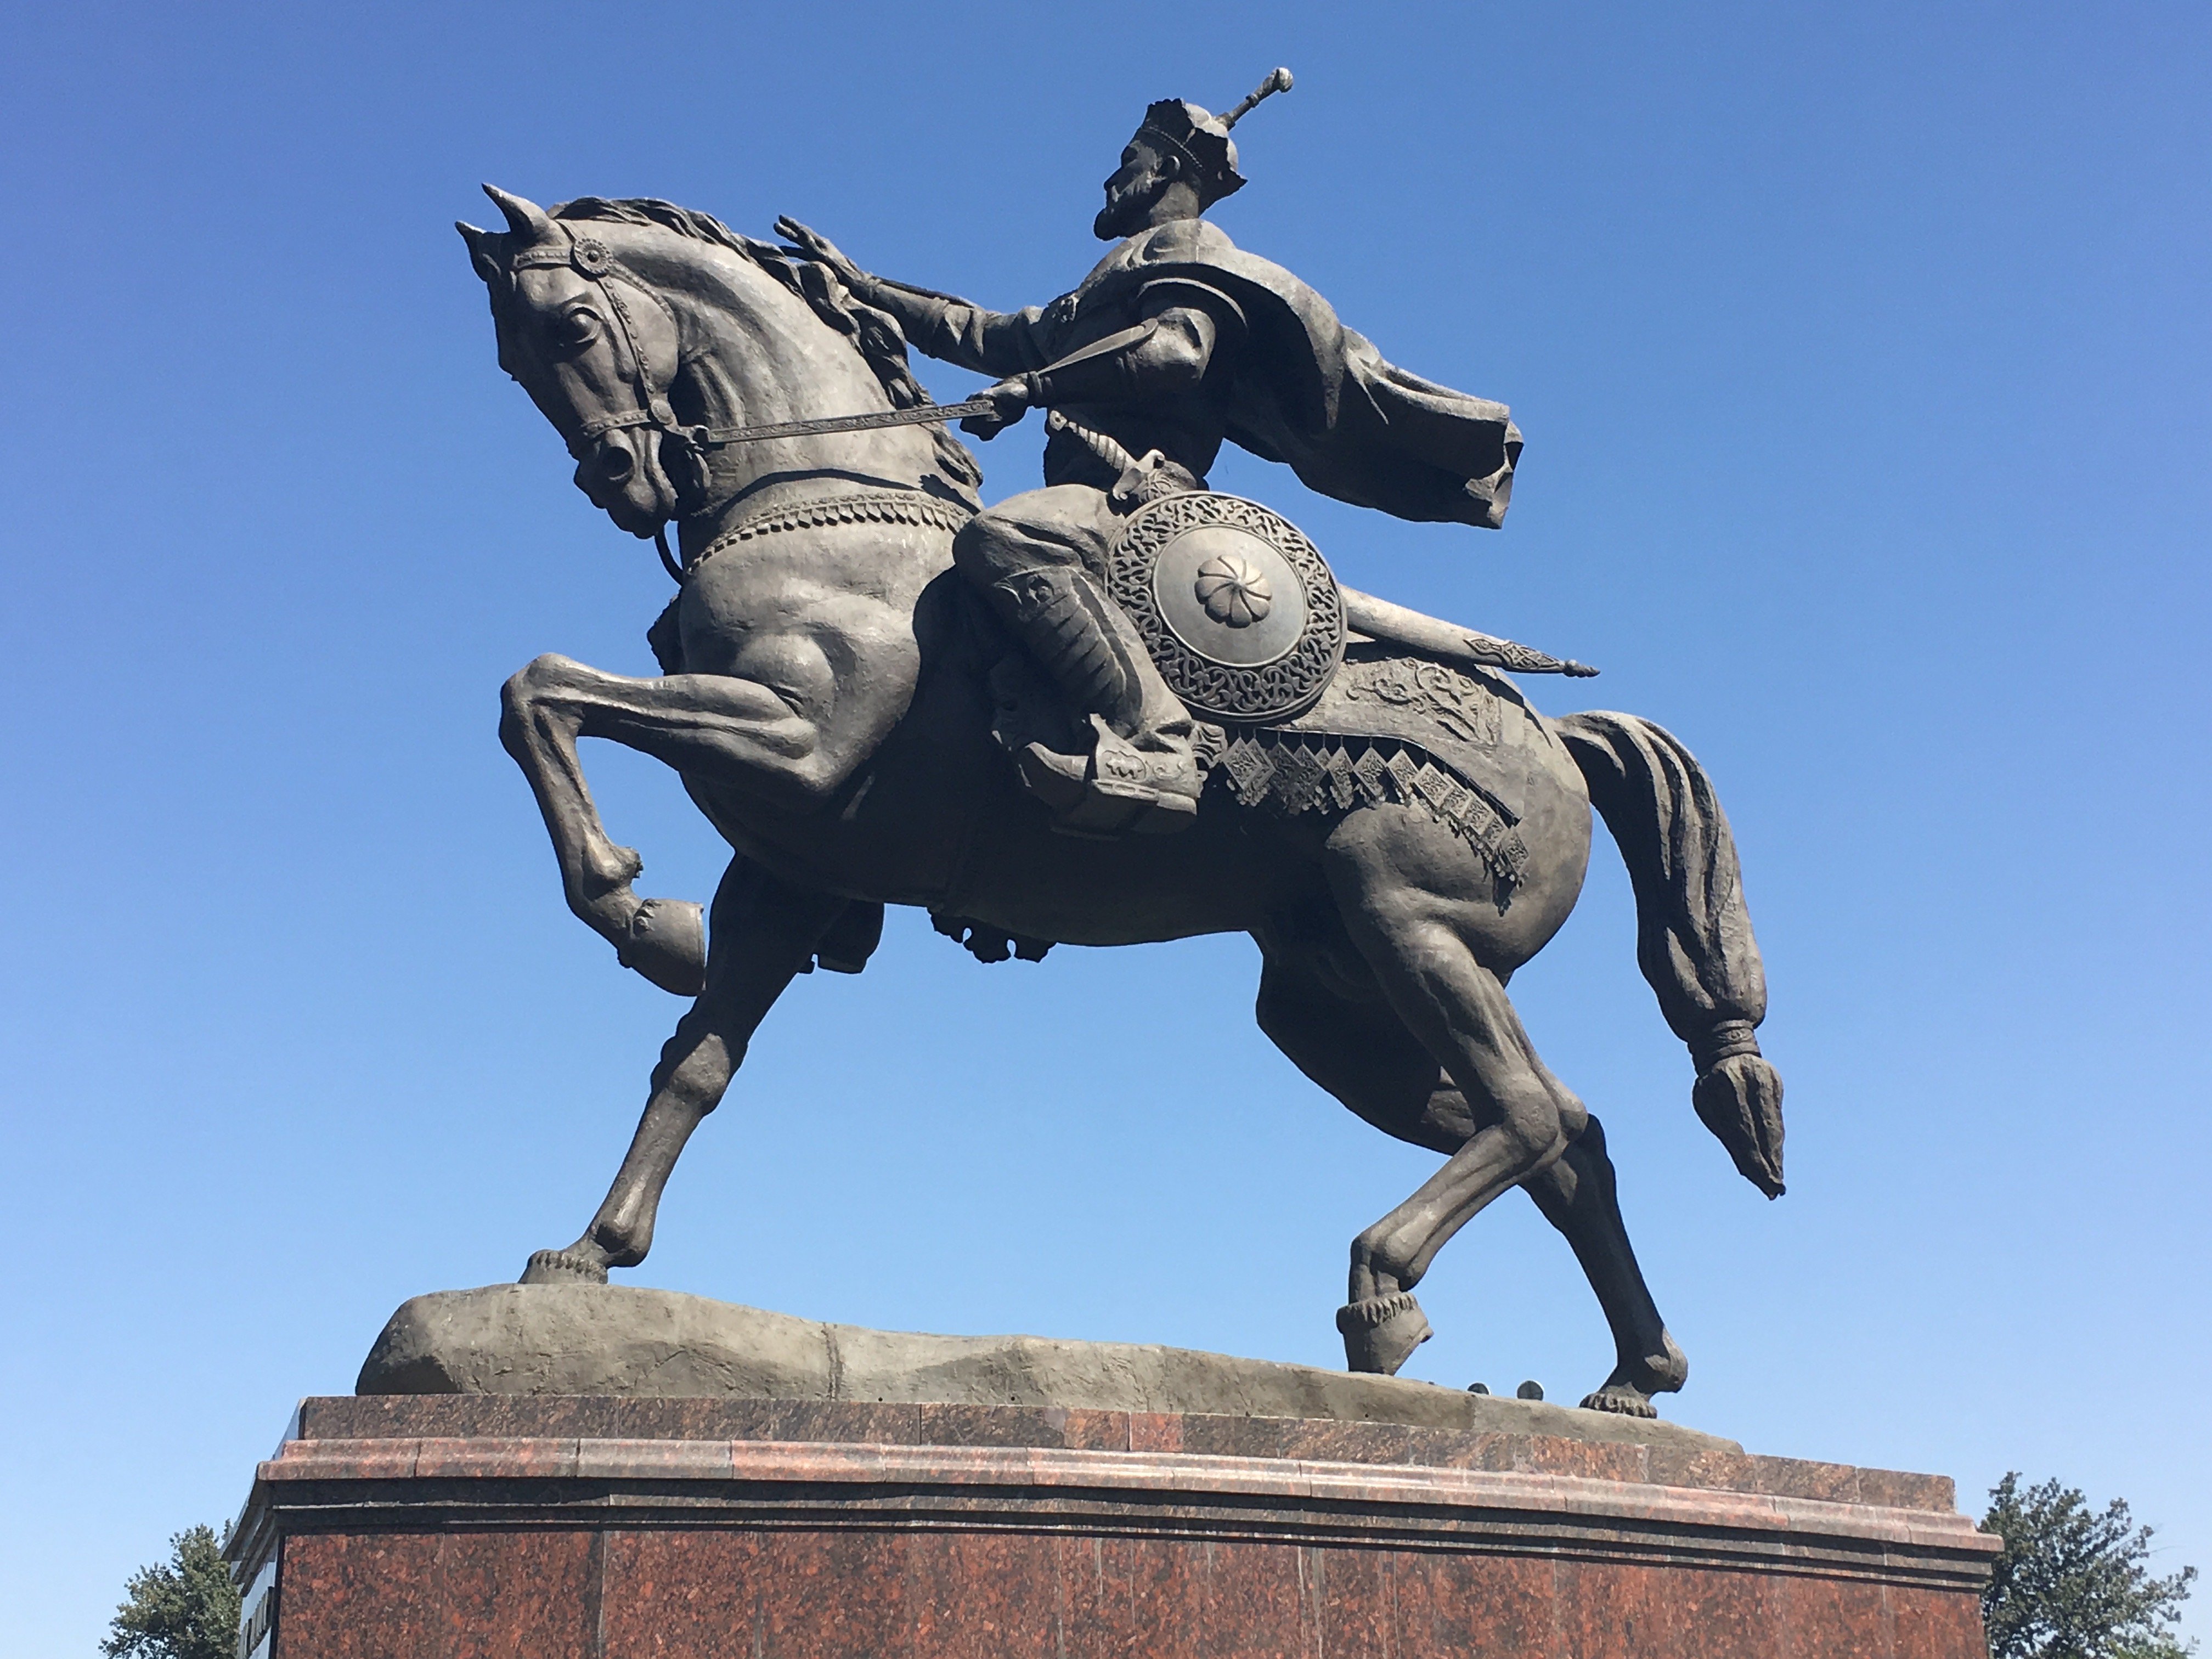 Timur Statue, Tashkent, Uzbekistan